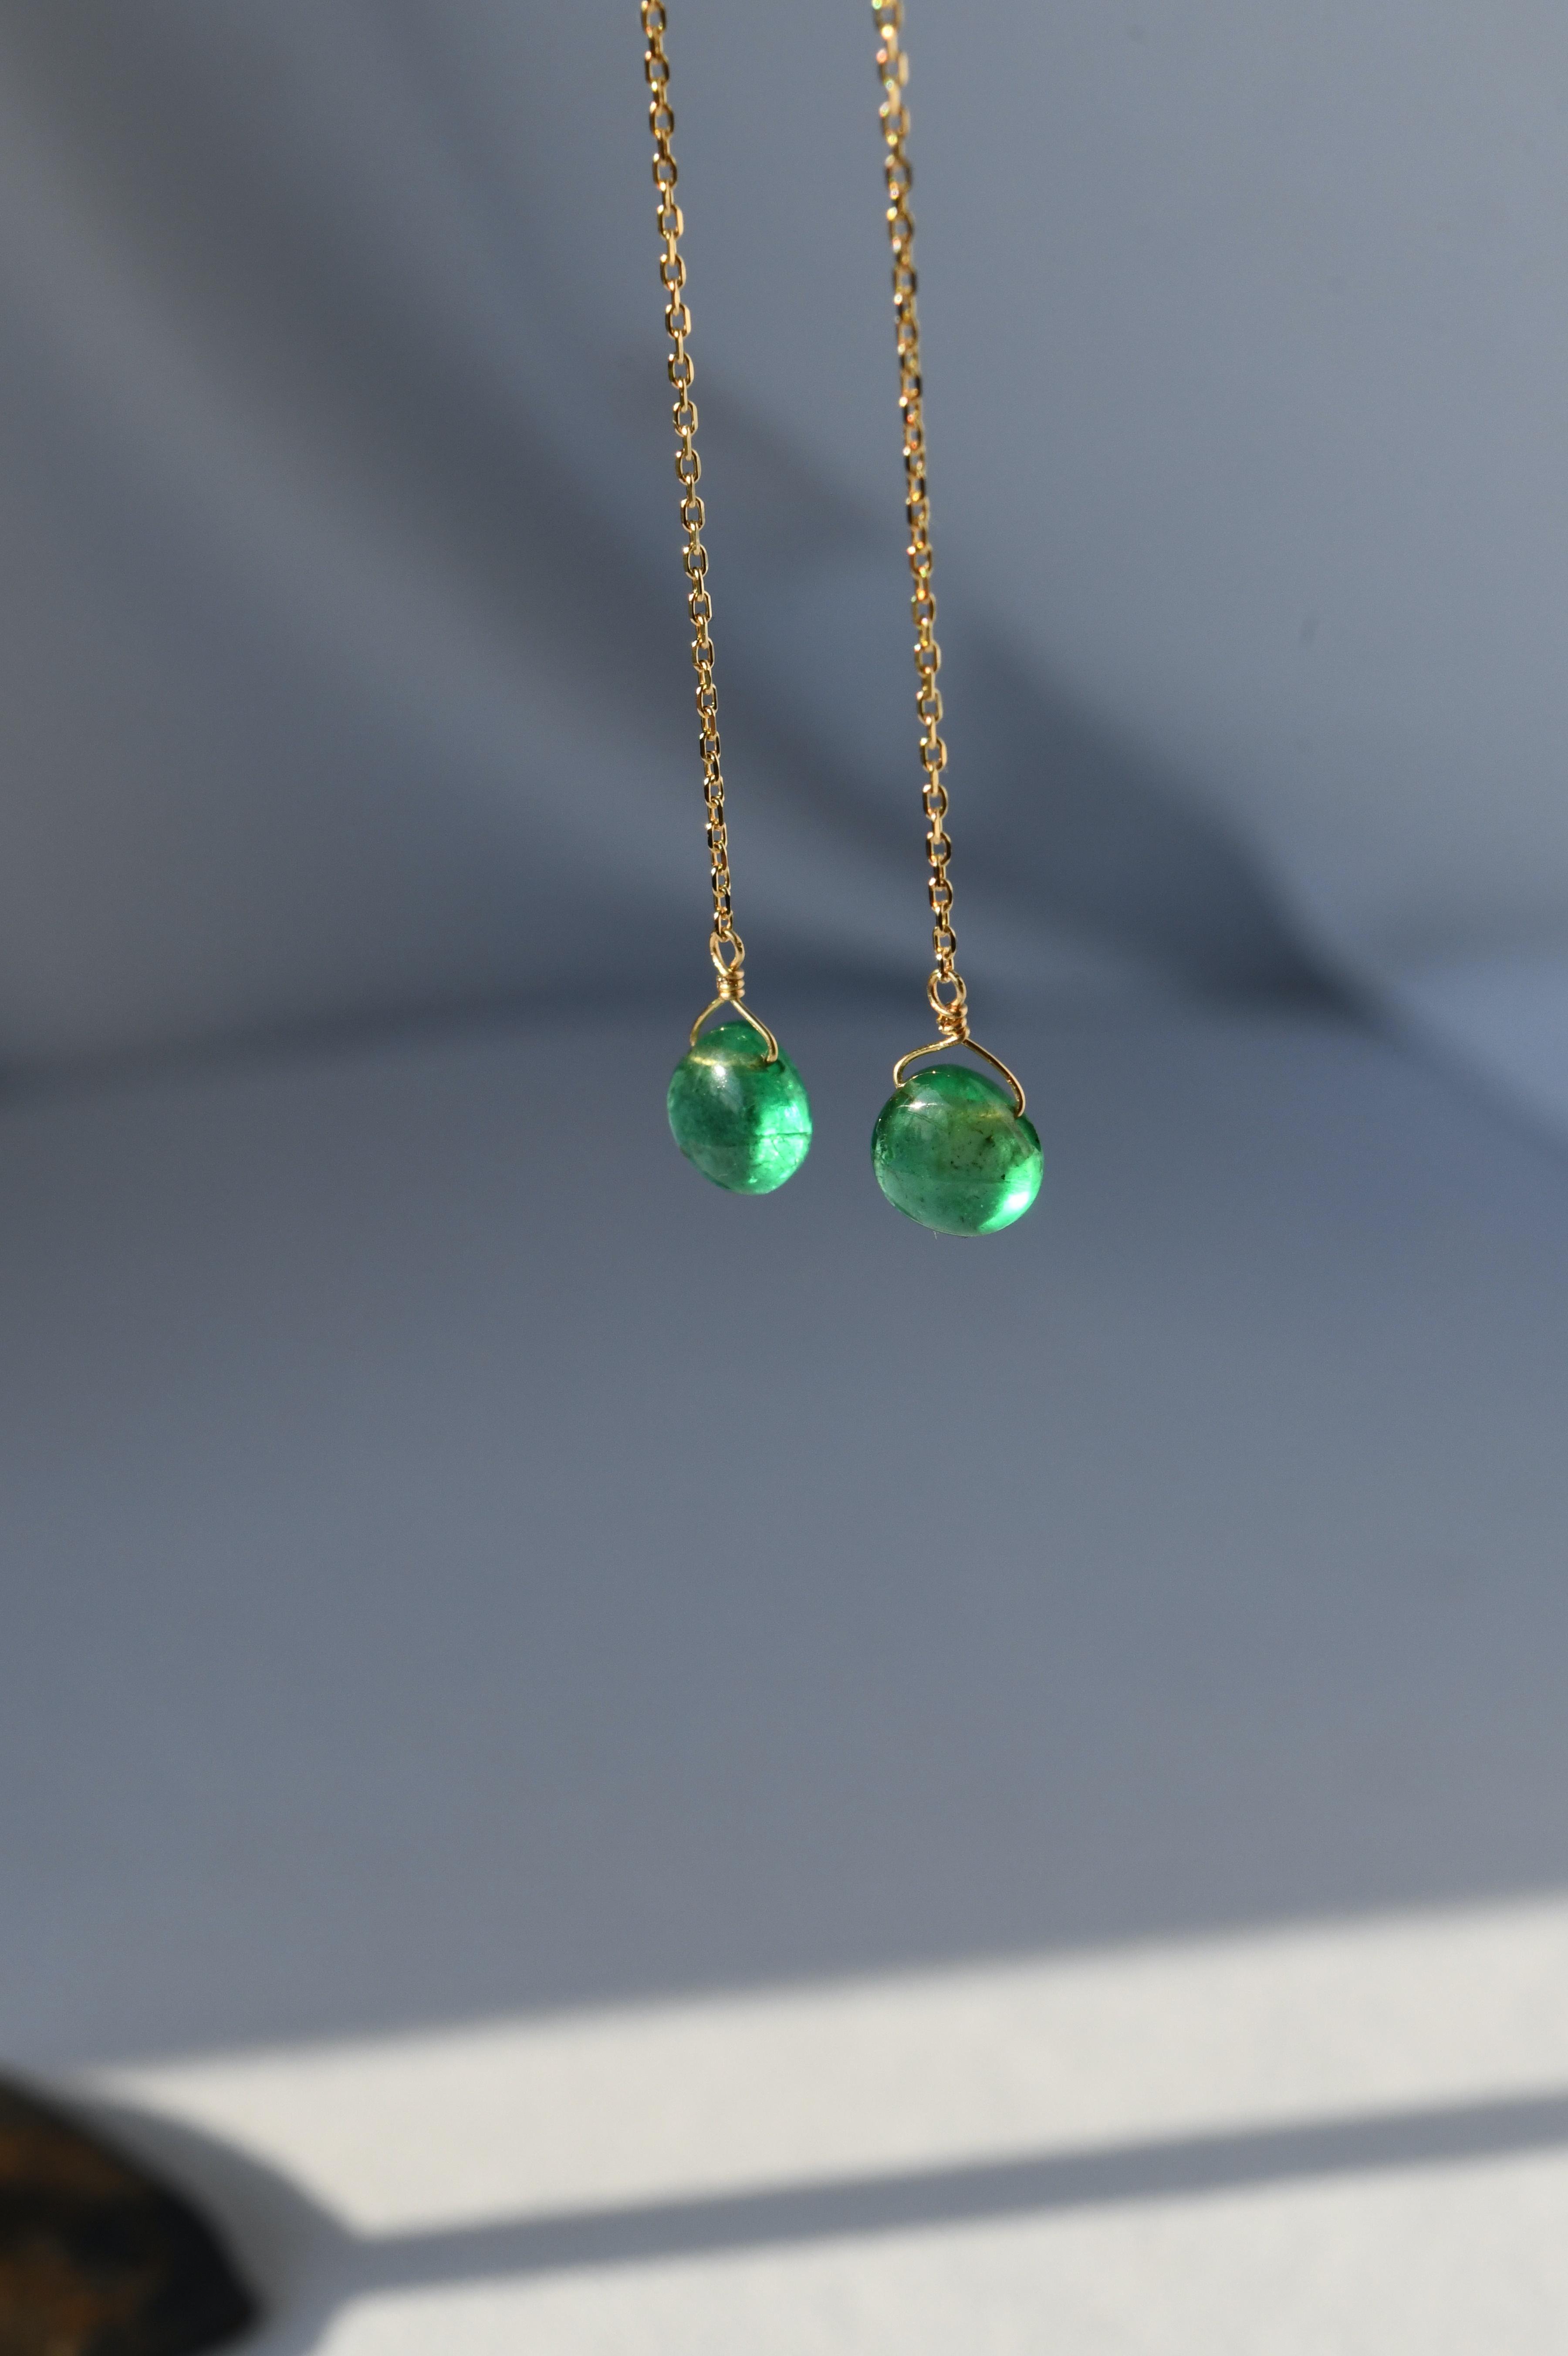 K18 Emerald Chain Earrings 18金エメラルドチェーンピアス/イヤリング